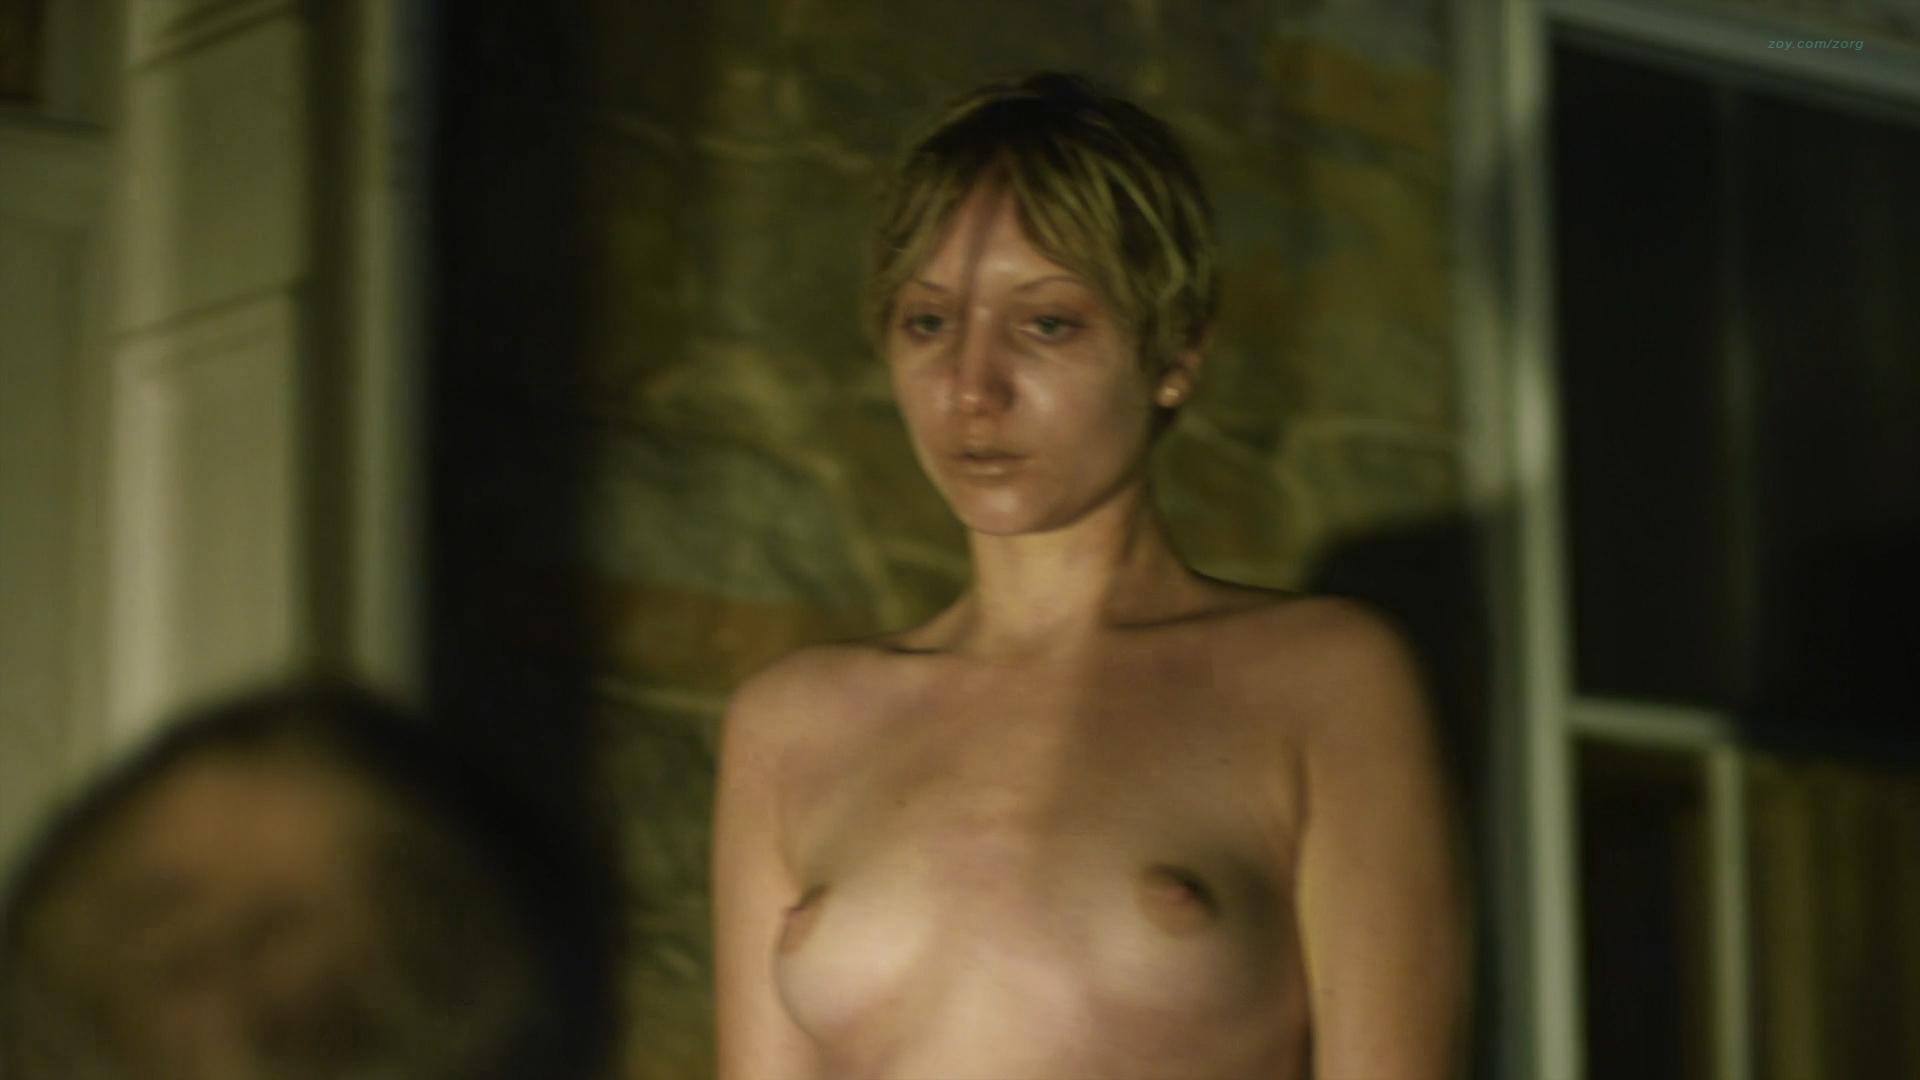 Gretchen lodge nude